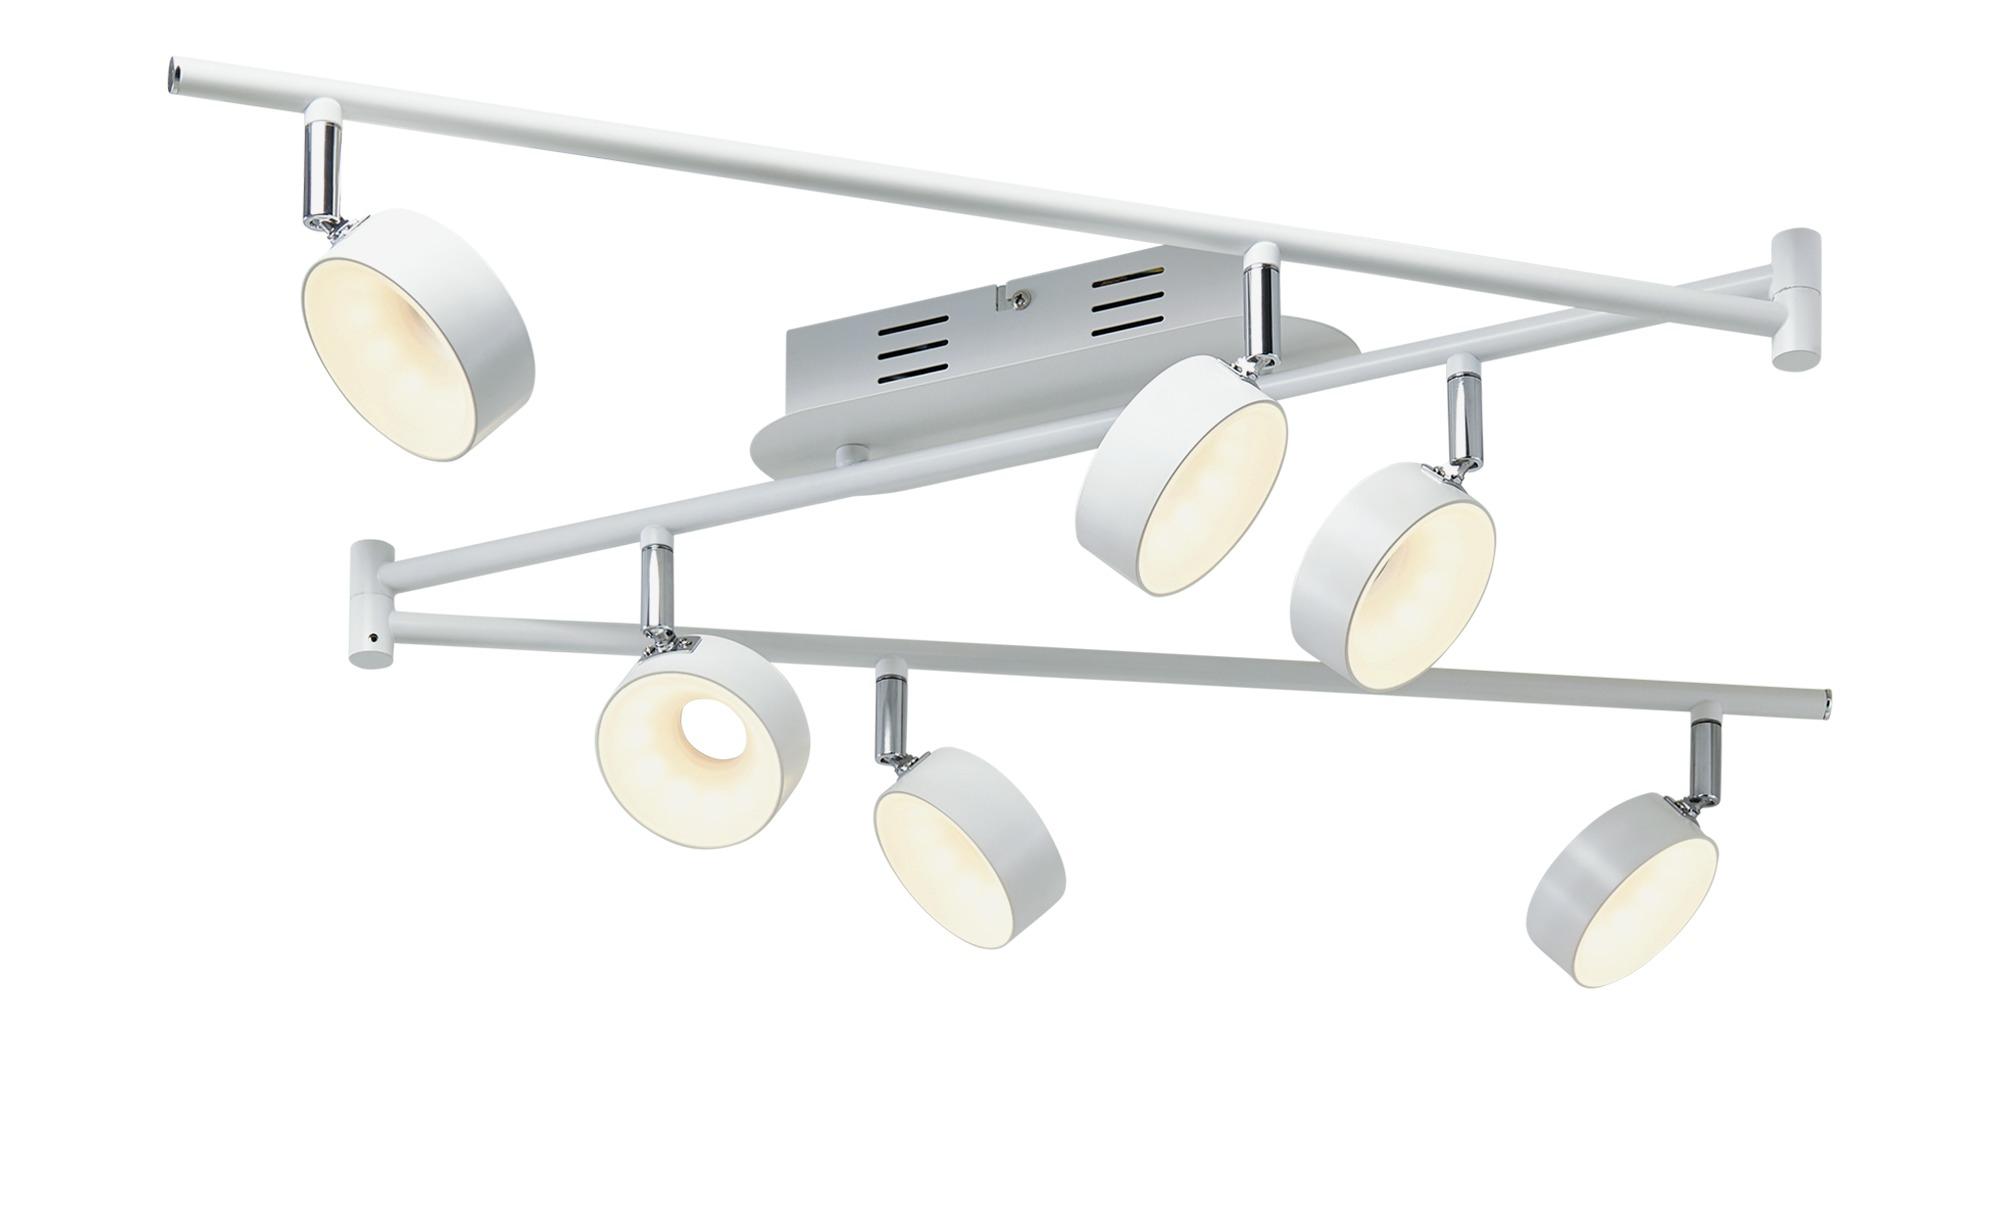 KHG LED-Spot, 6-flammig weiß ¦ weiß ¦ Maße (cm): B: 8,5 H: 20,5 Lampen & Leuchten > LED-Leuchten > LED-Strahler & Spots - Höffner